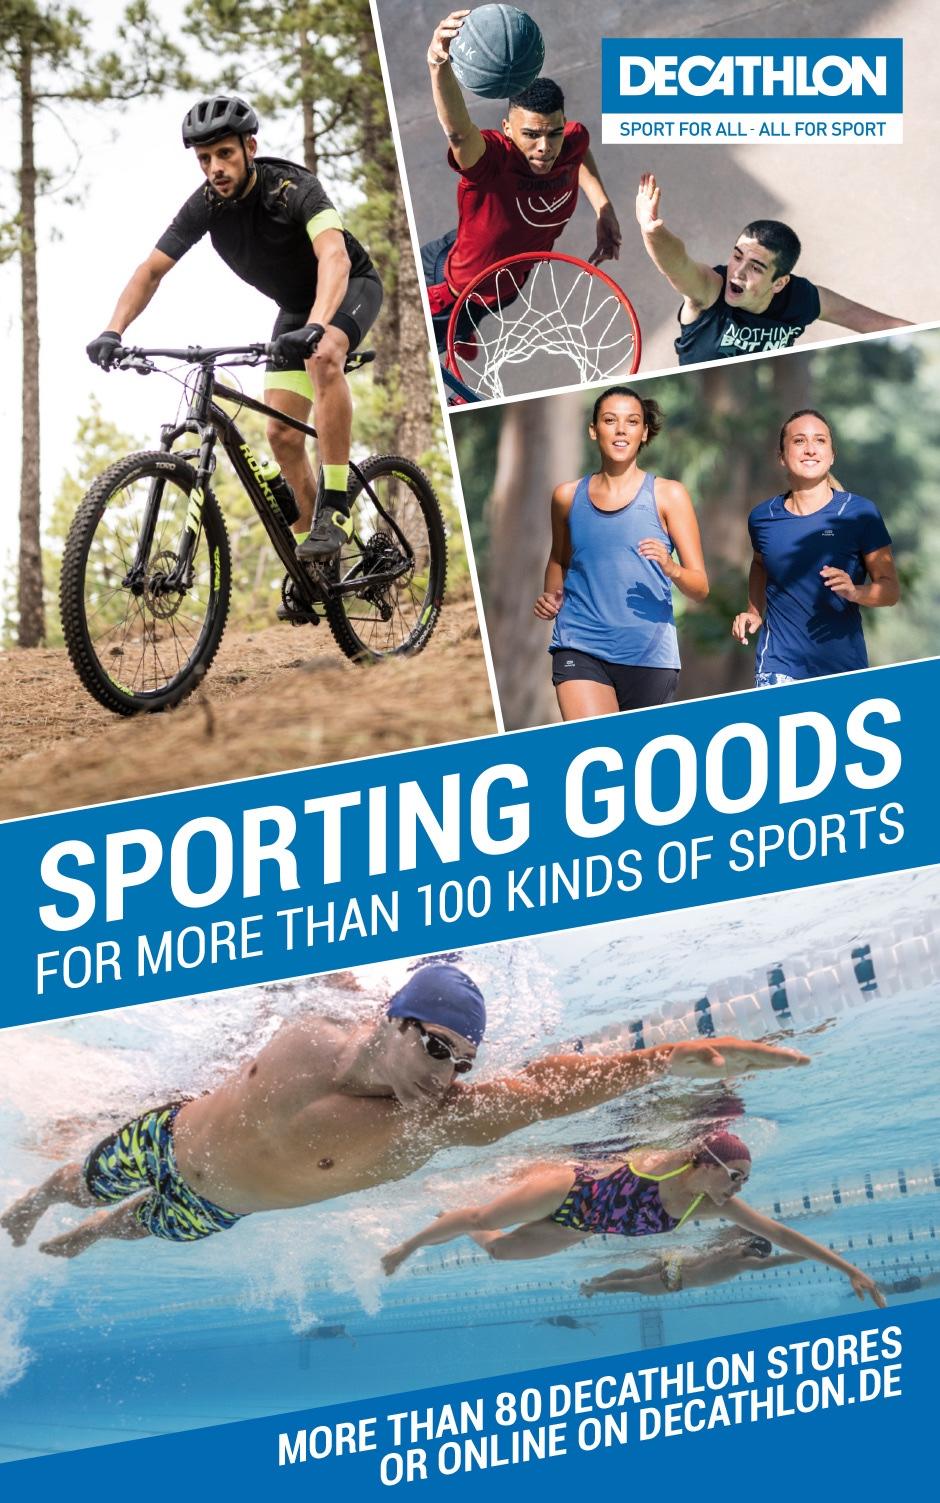 Decathlon Sporting goods